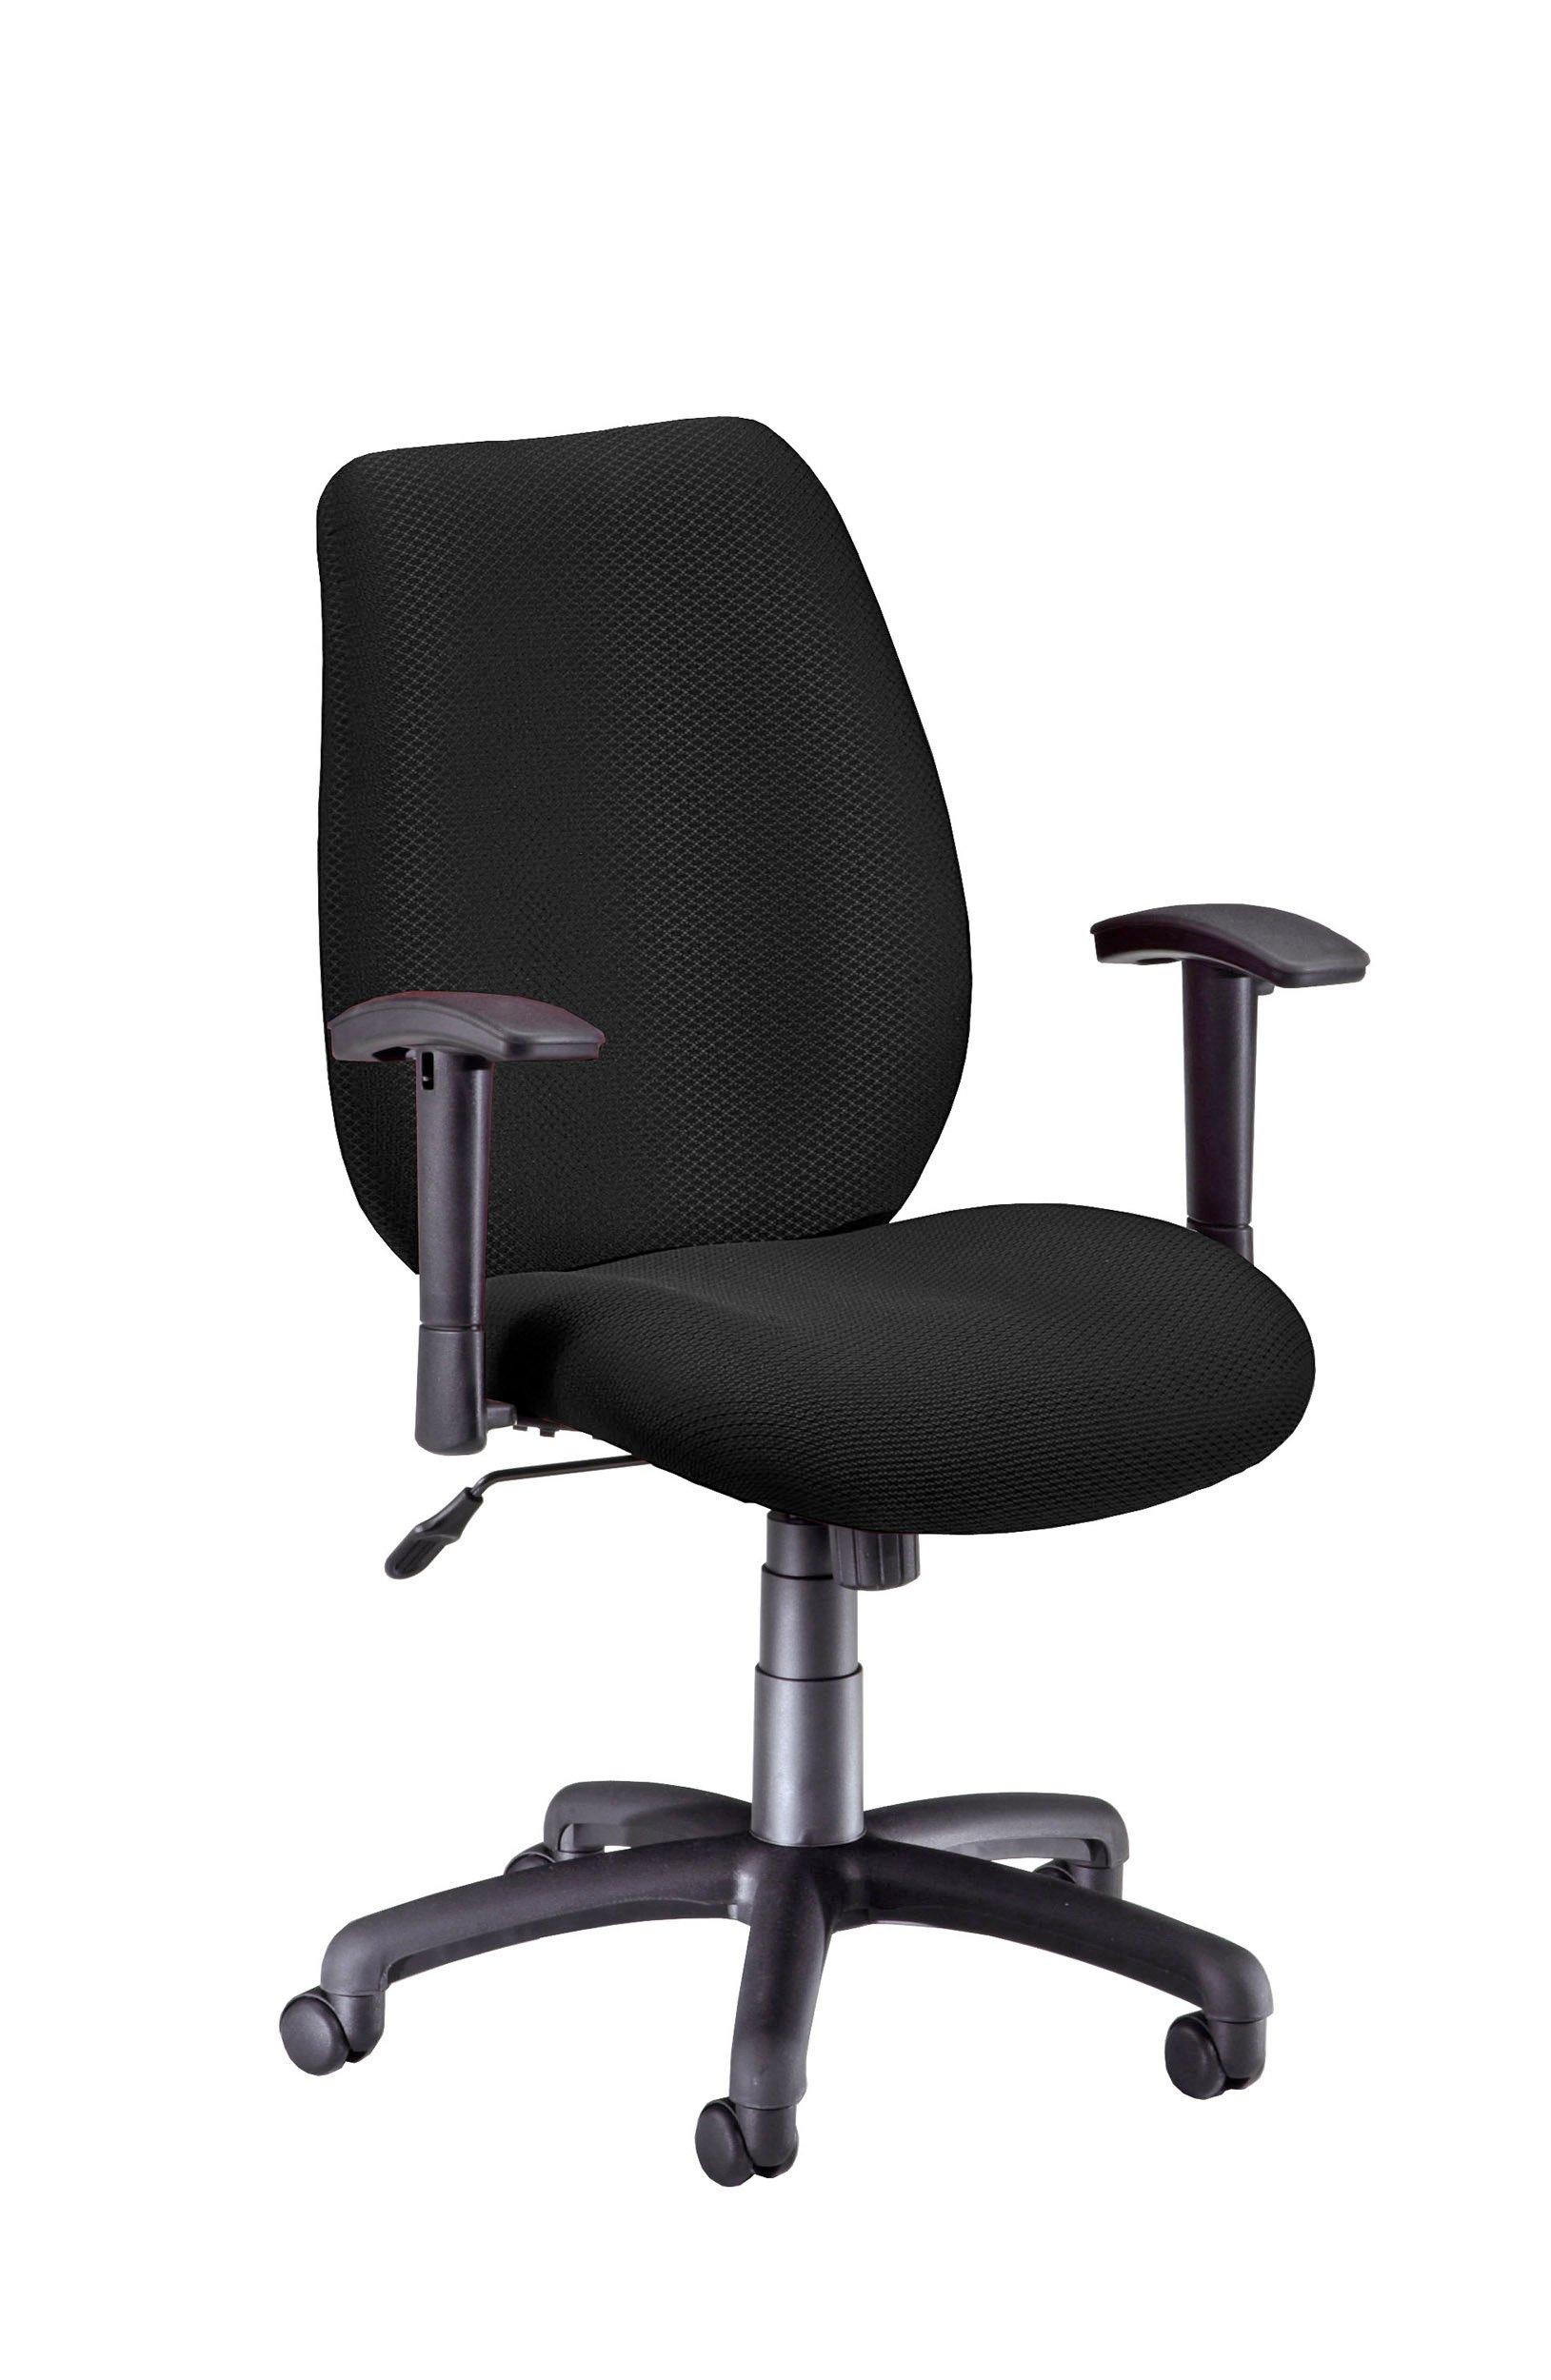 OFM 611-20 Ergonomic Managers Chair, Ebony